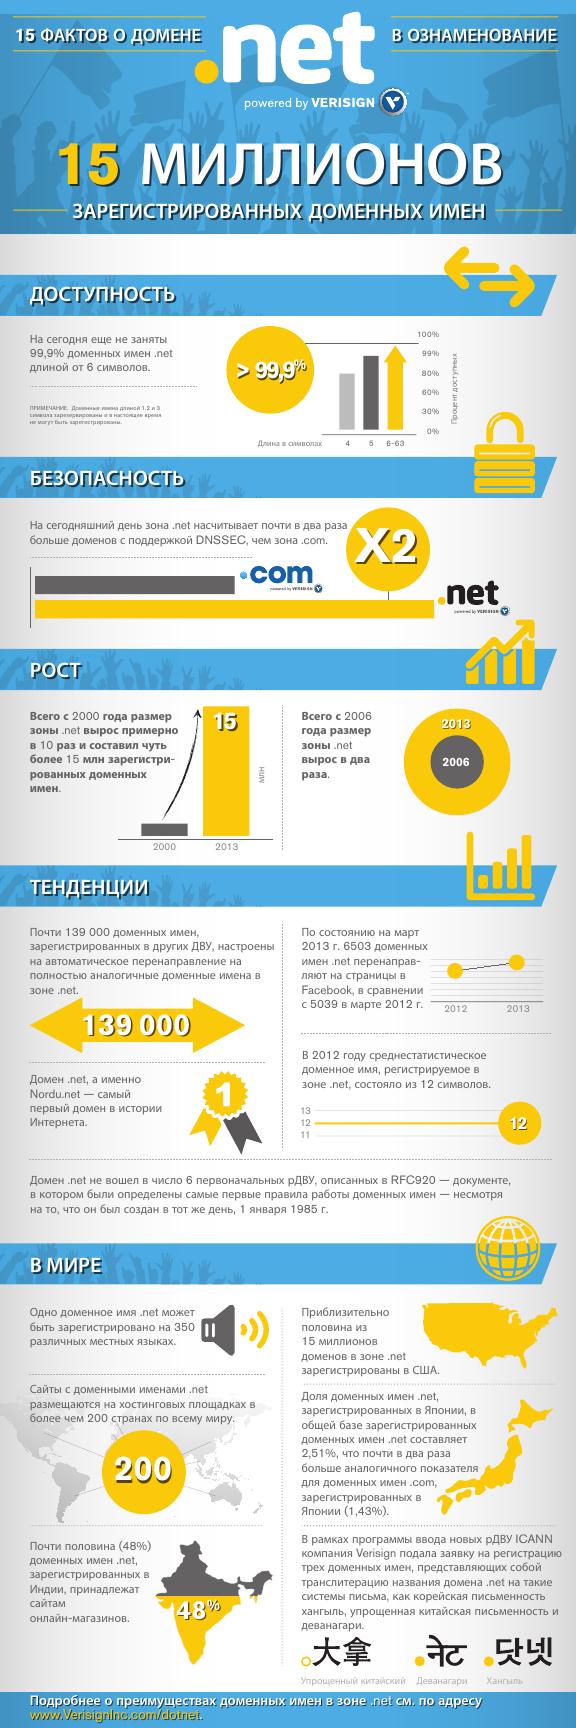 infographic-net-15-facts-ru_RU_1